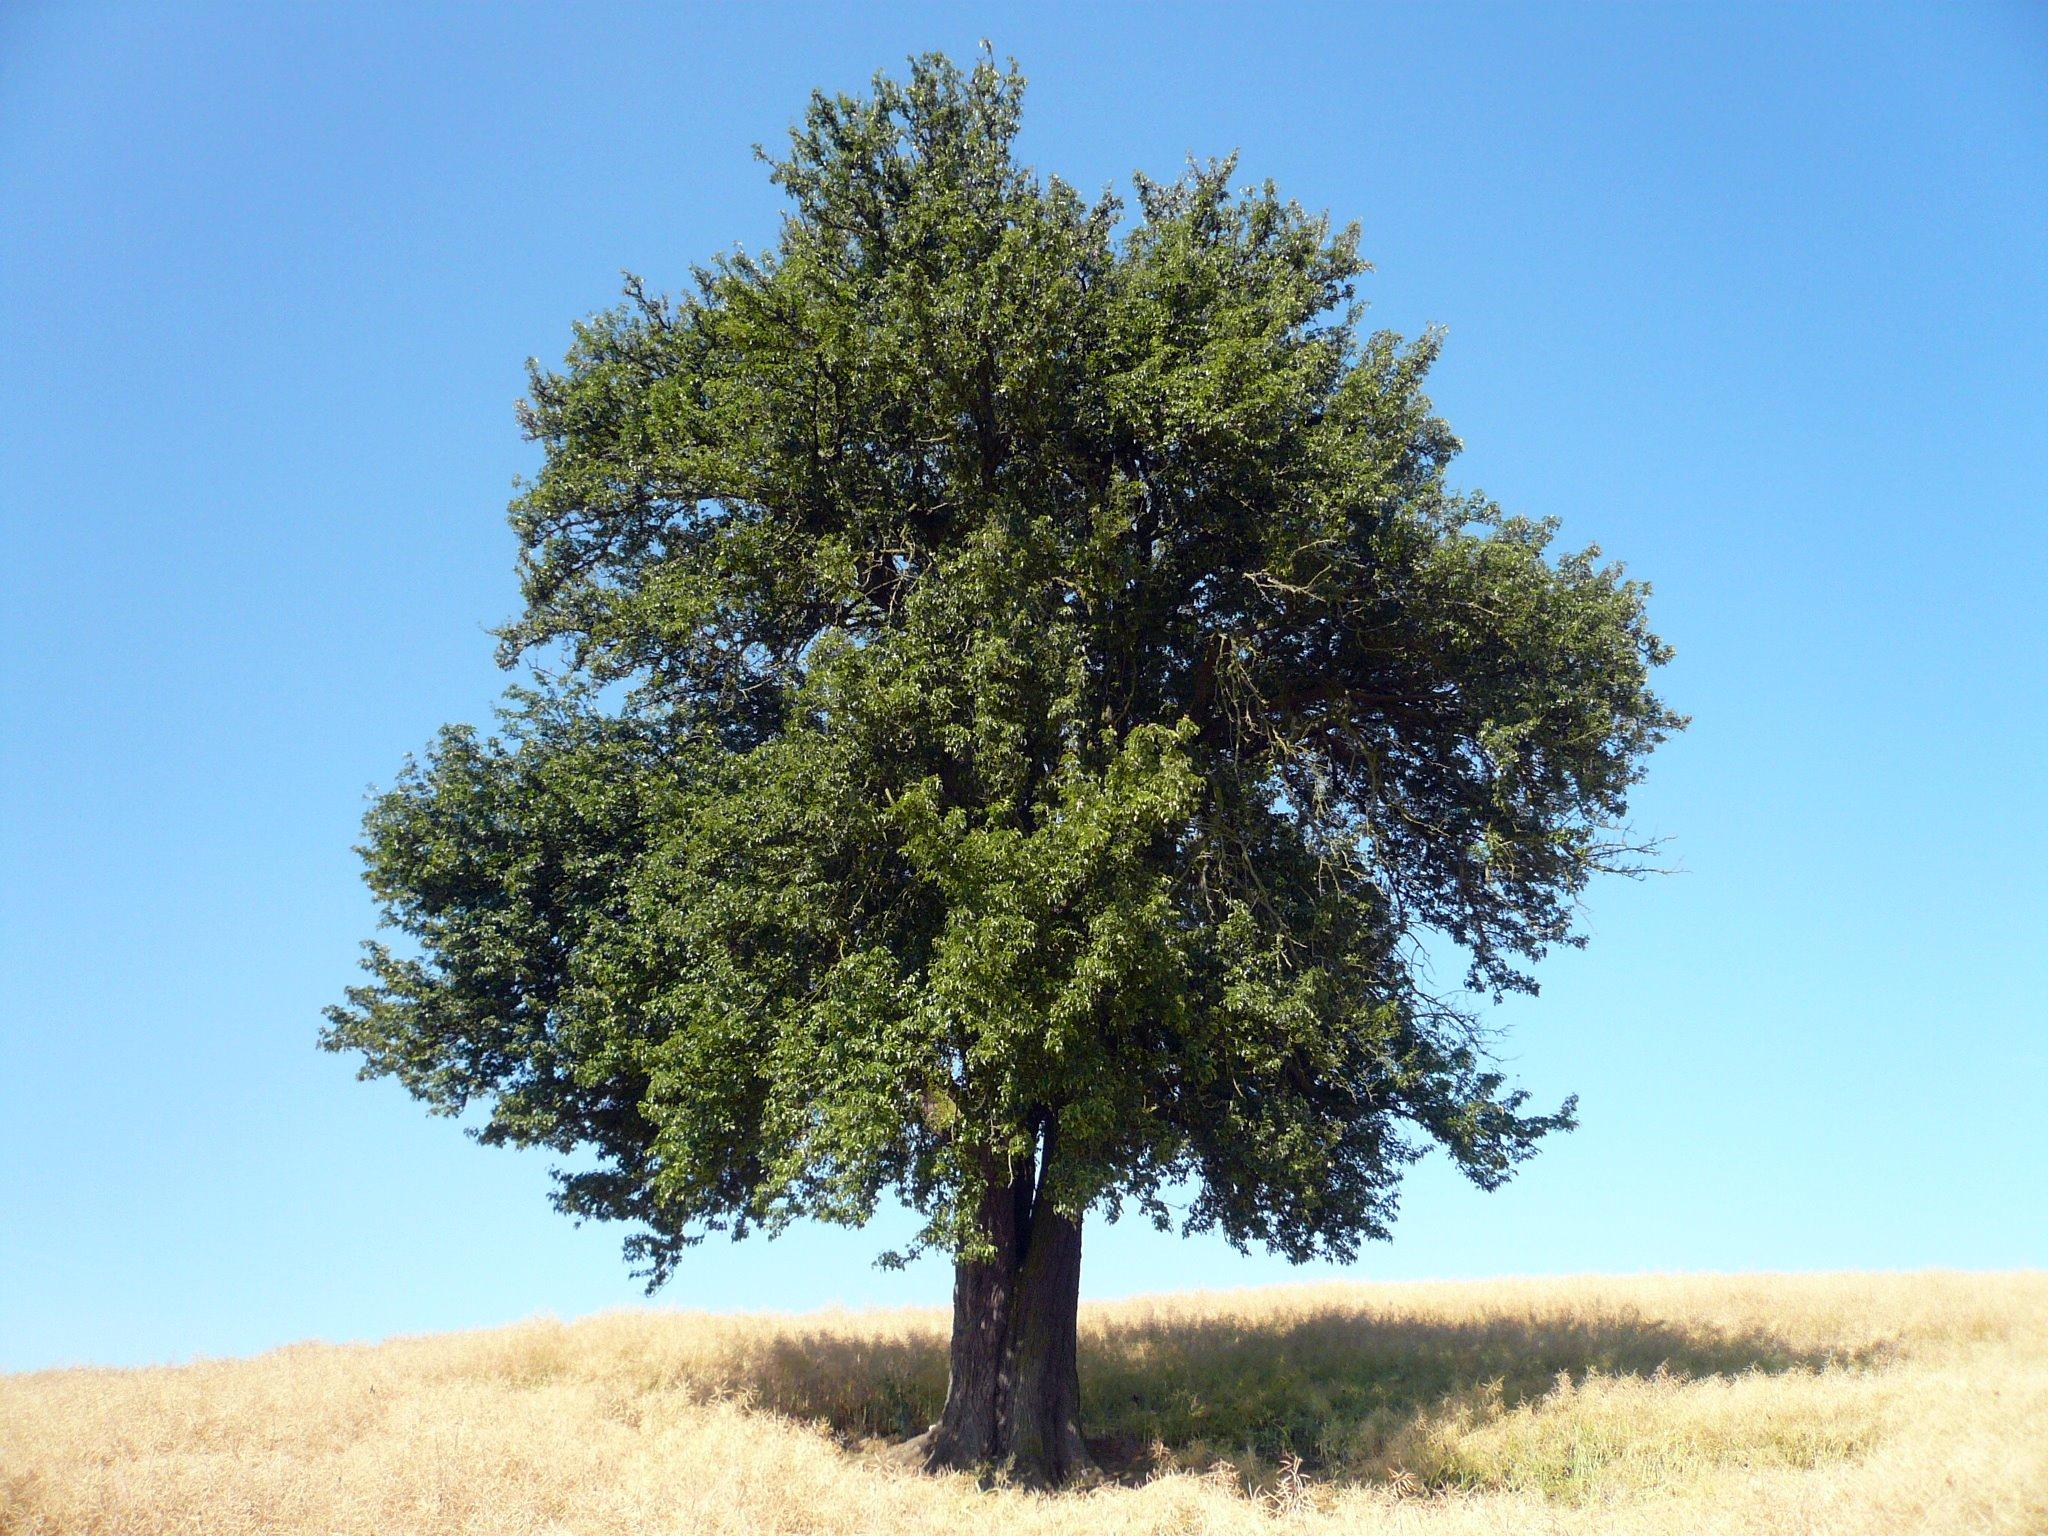 File:Birnbaum am Lerchenberg.jpg - Wikimedia Commons